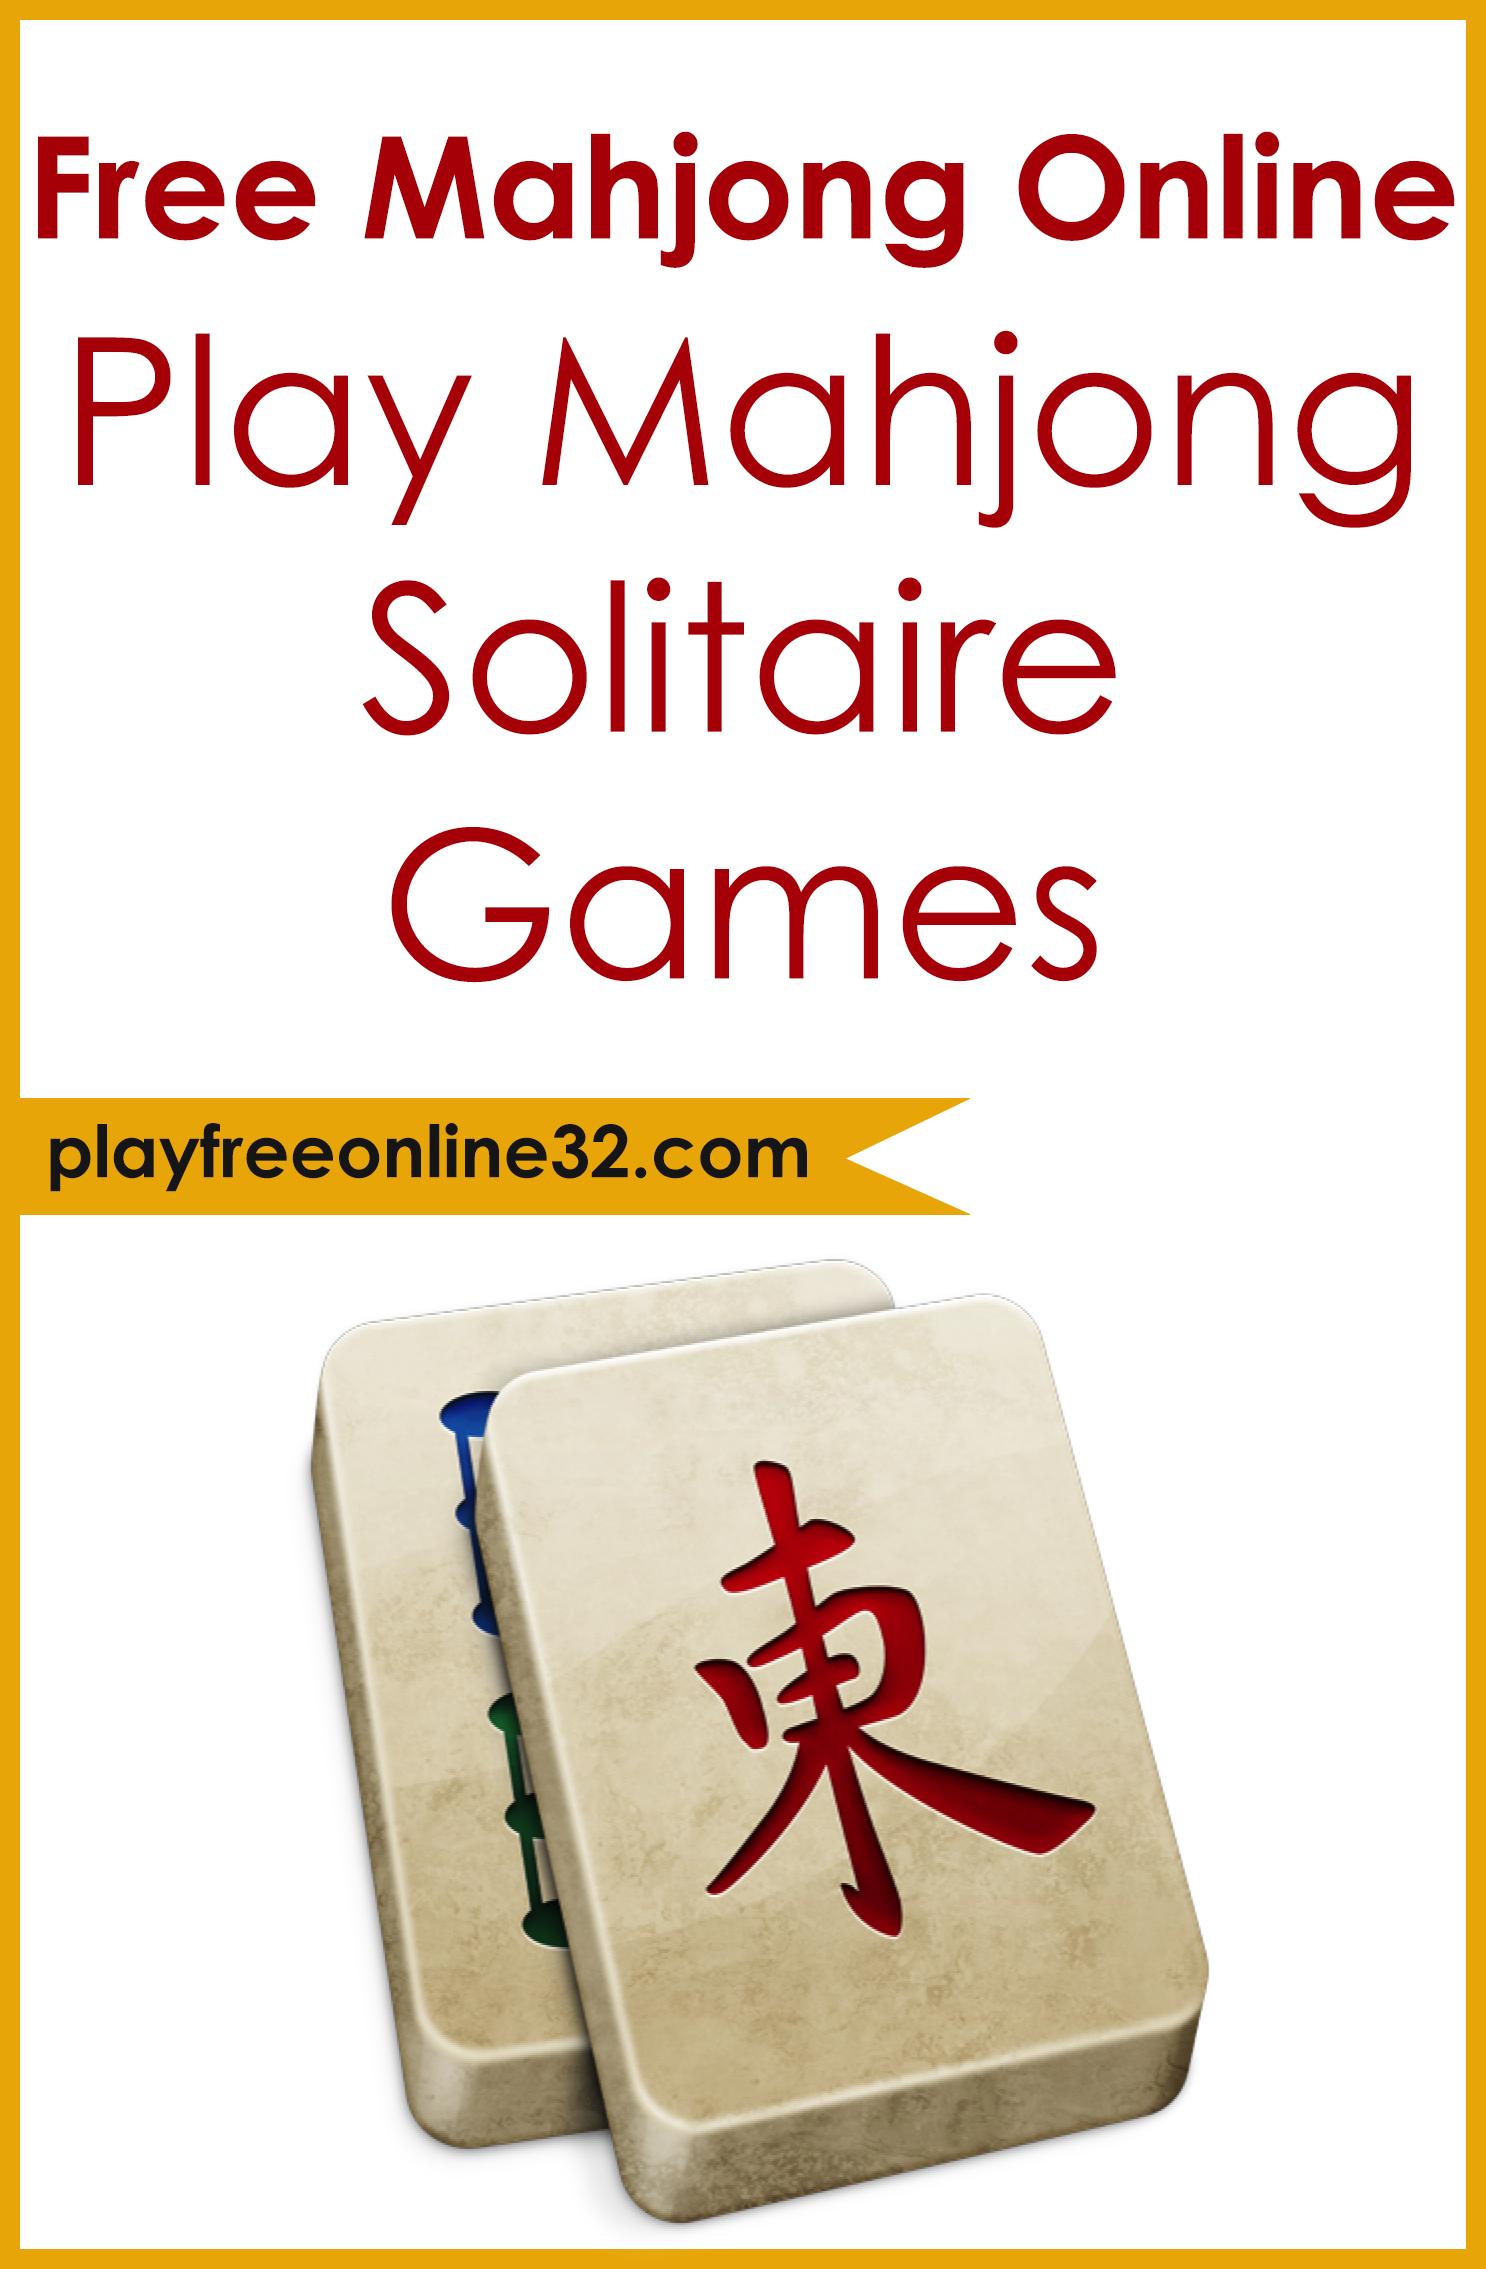 Free Mahjong Online • Play Mahjong Solitaire Games